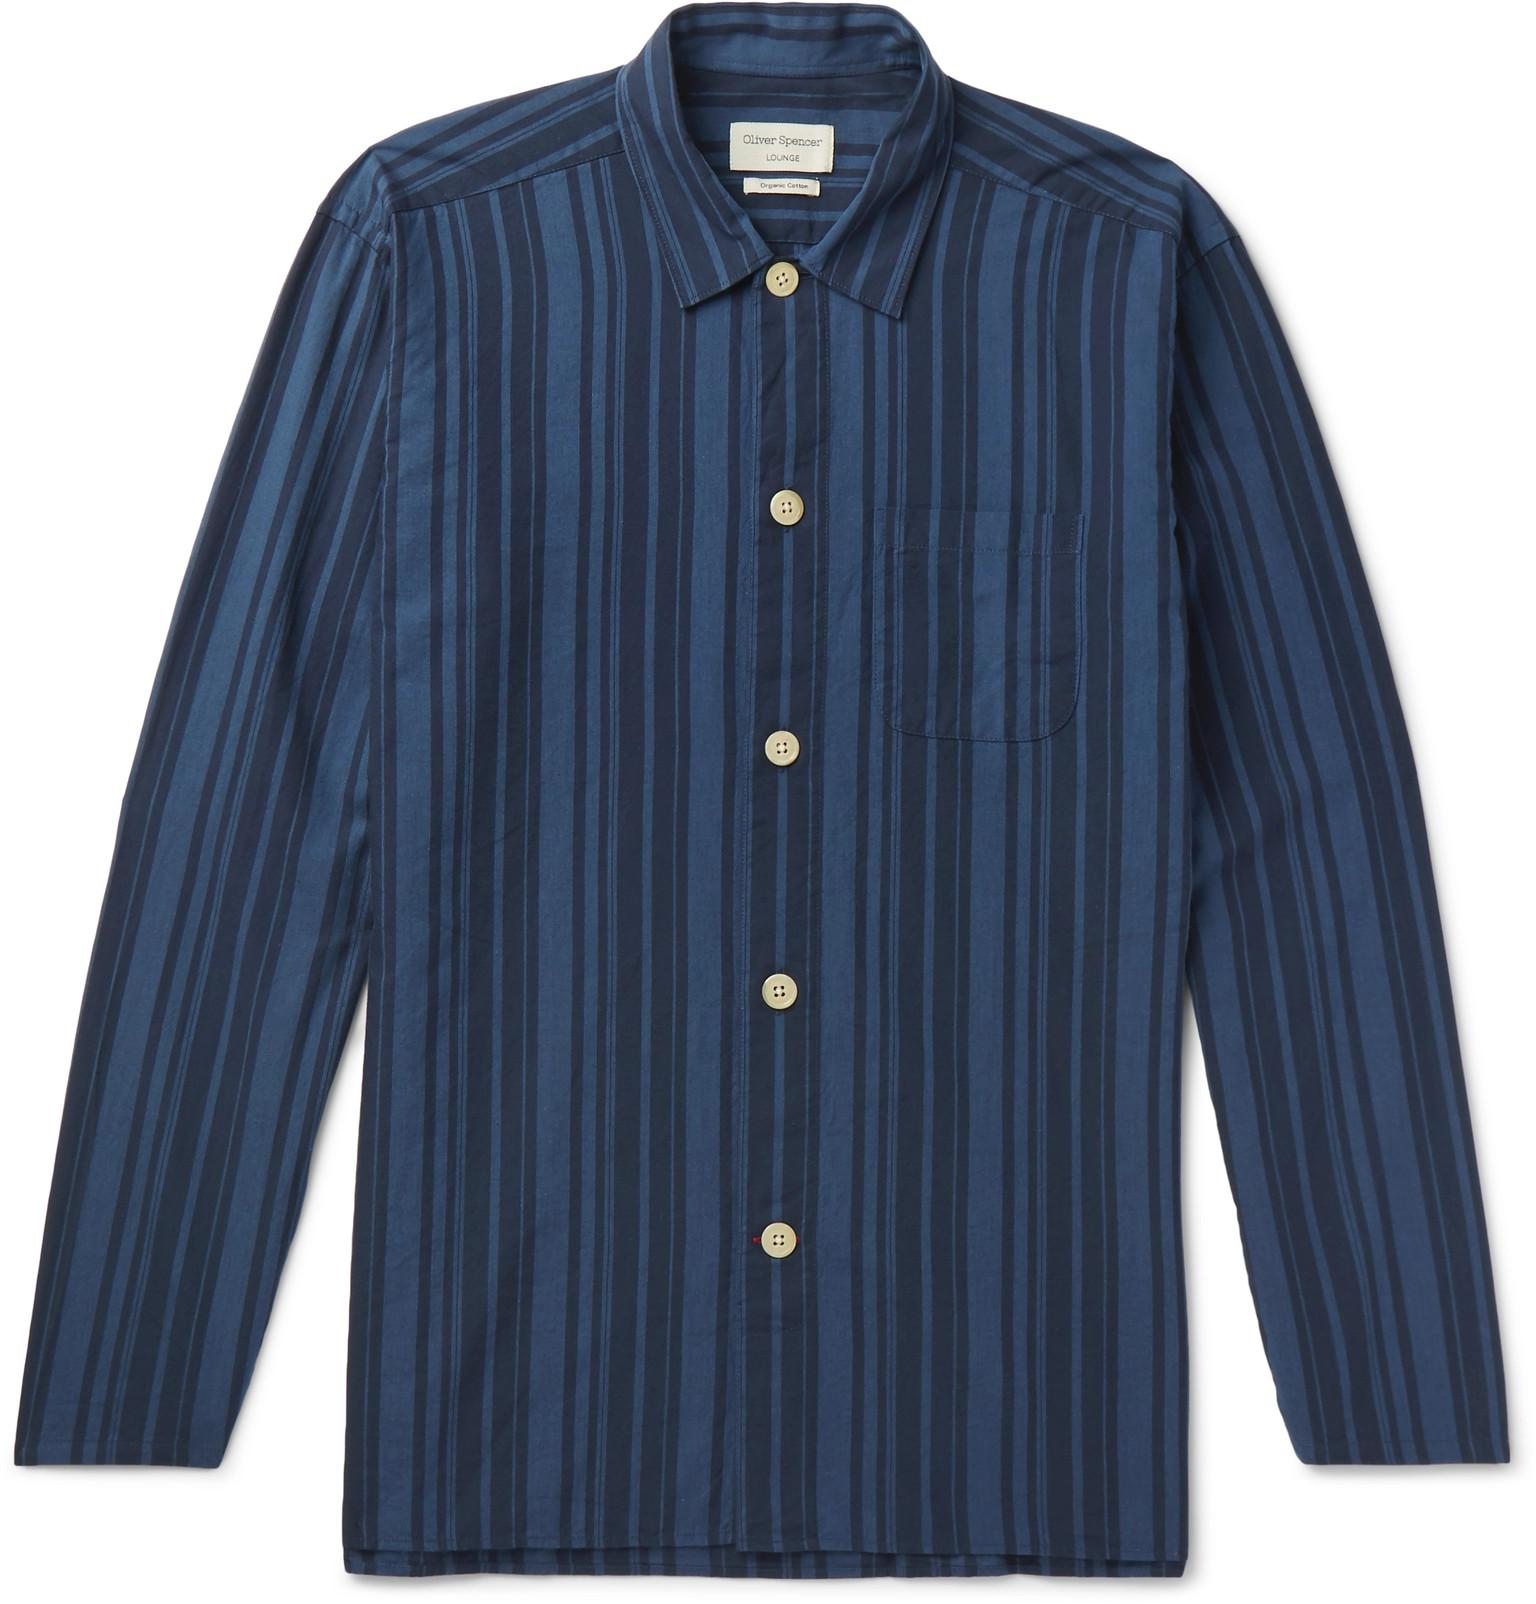 OLIVER SPENCER Farrow Striped Organic Cotton Pyjama Shirt - Navy WVBd2G5